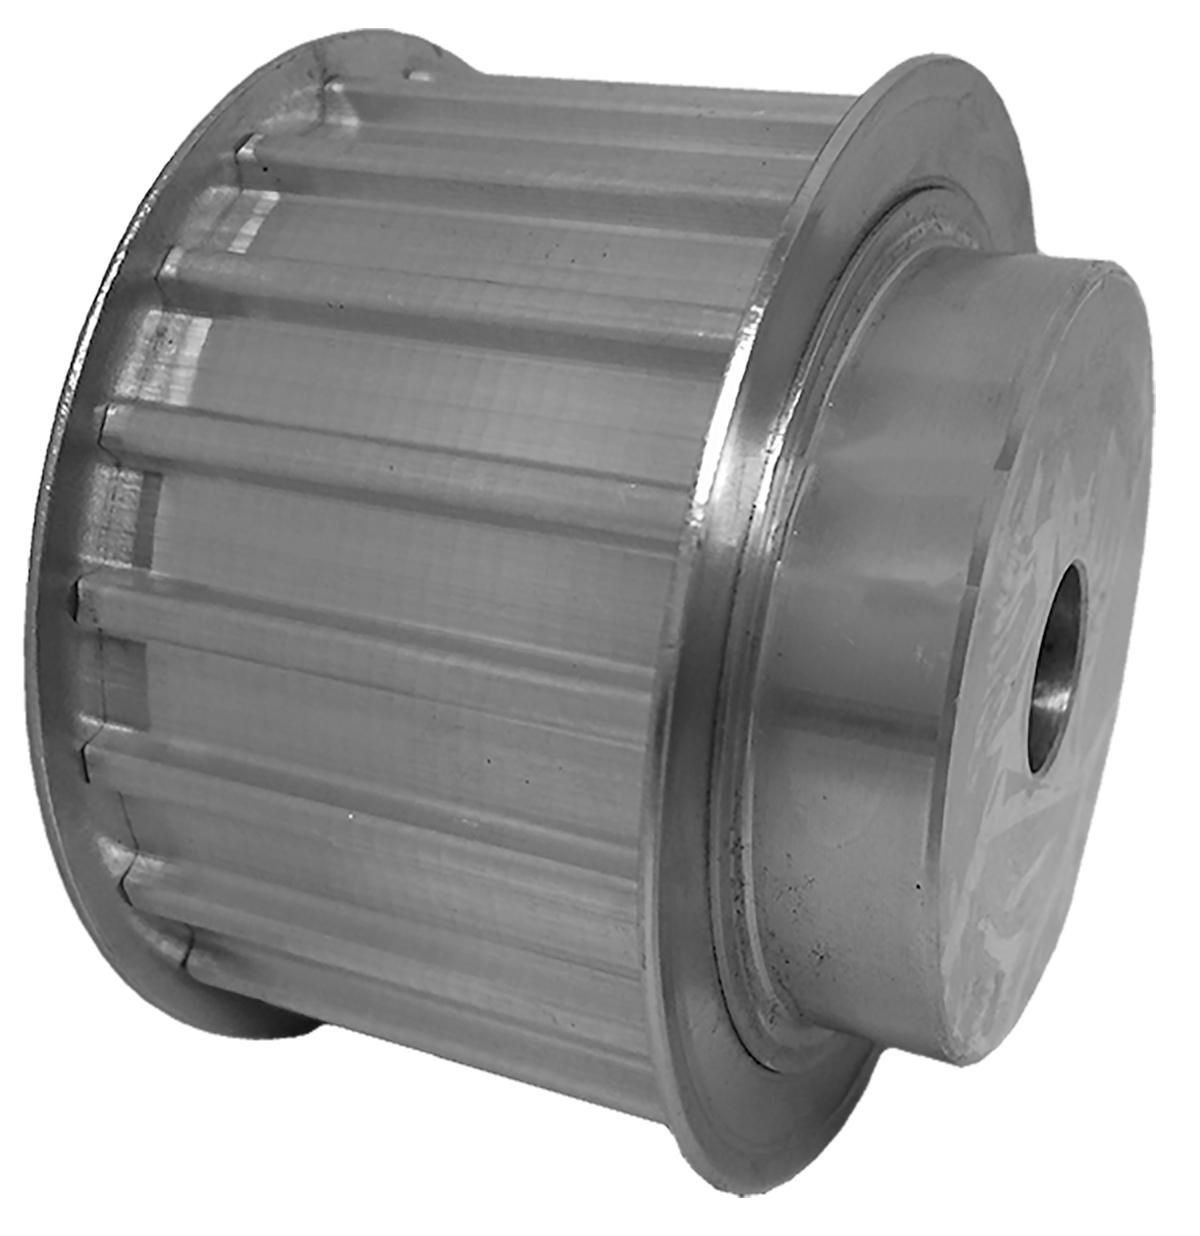 47AT10/20-2 - Aluminum Metric Pulleys